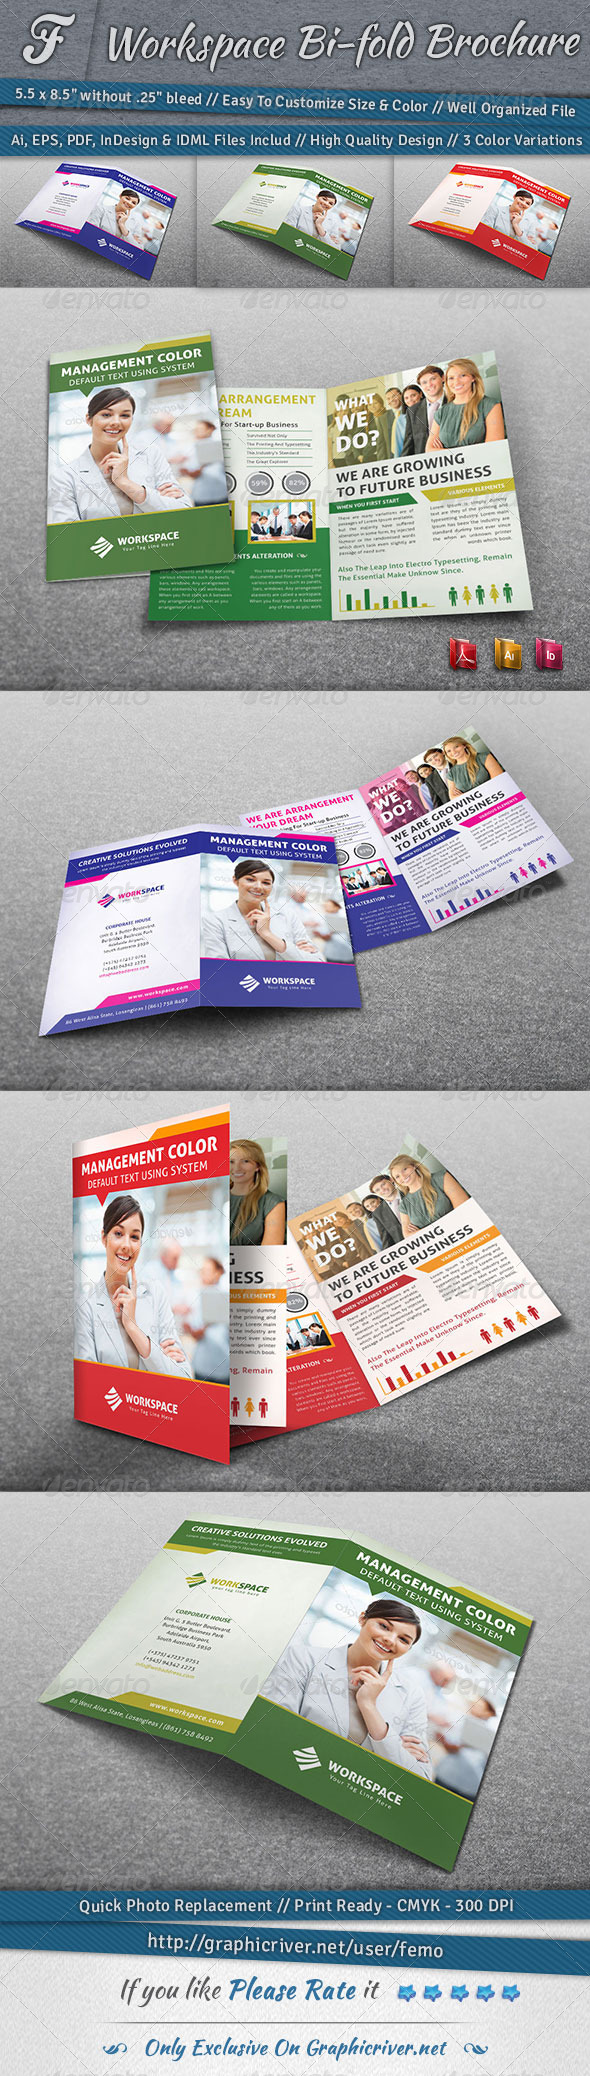 GraphicRiver Workspace Bi-fold Brochure 6856116